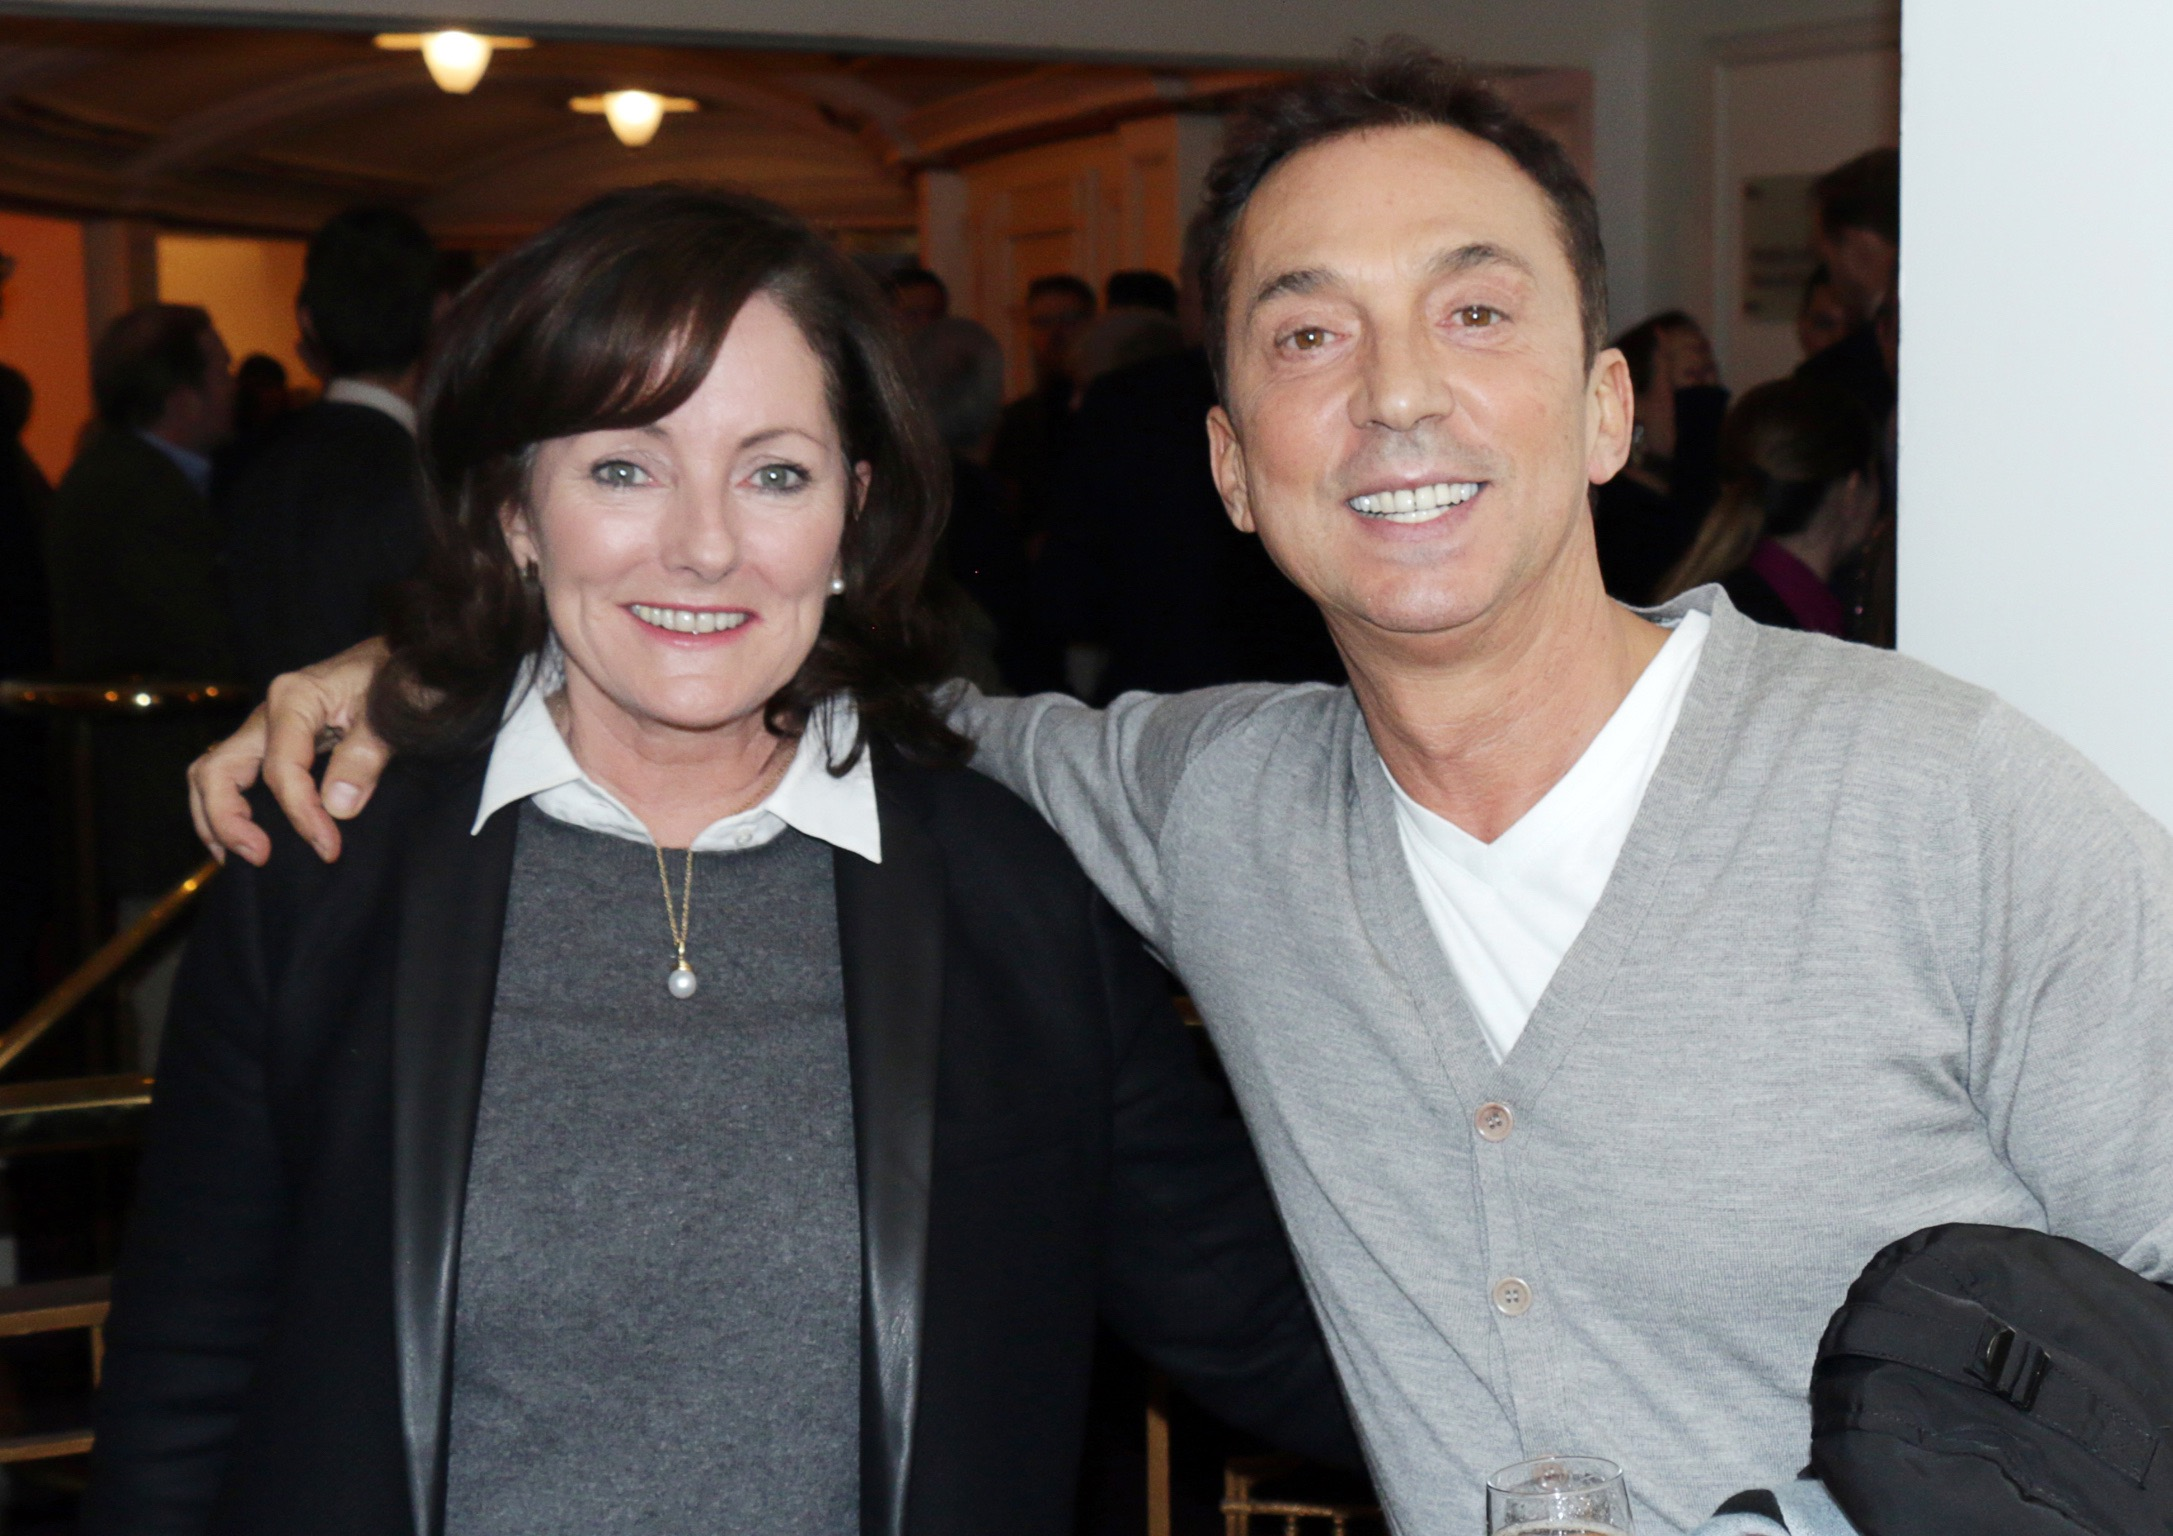 Jacquie Storey with Bruno Tonioli